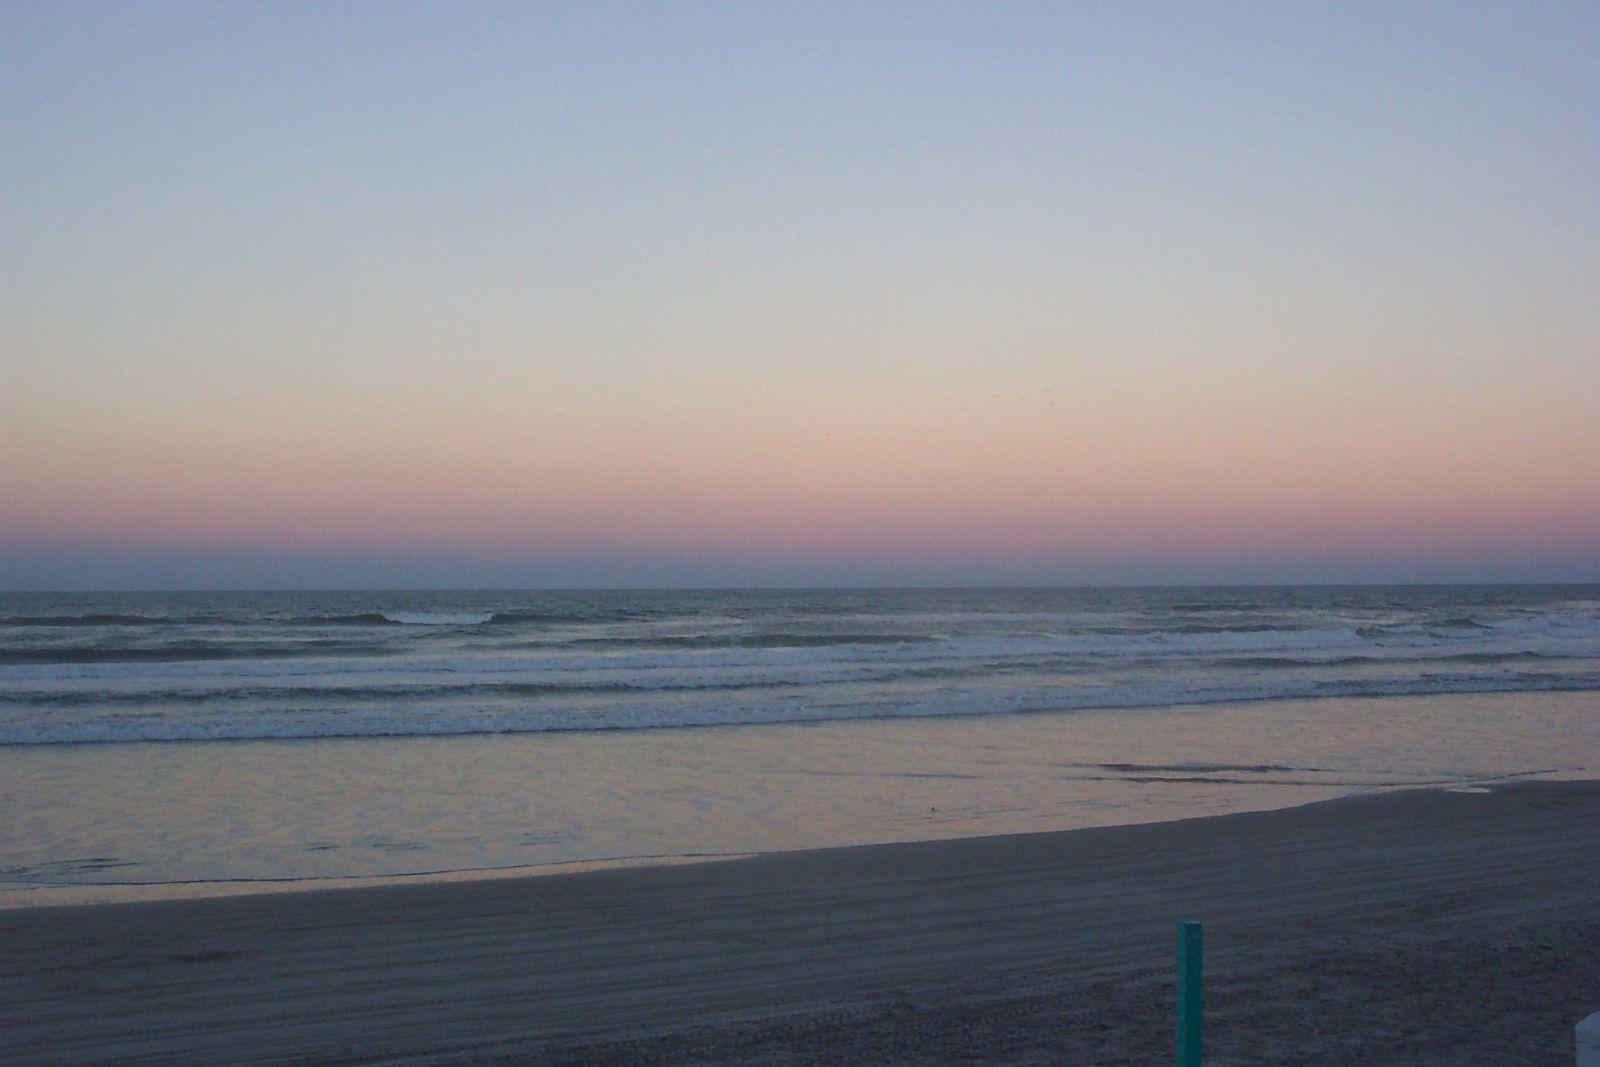 Daytona Beach 1600x1067